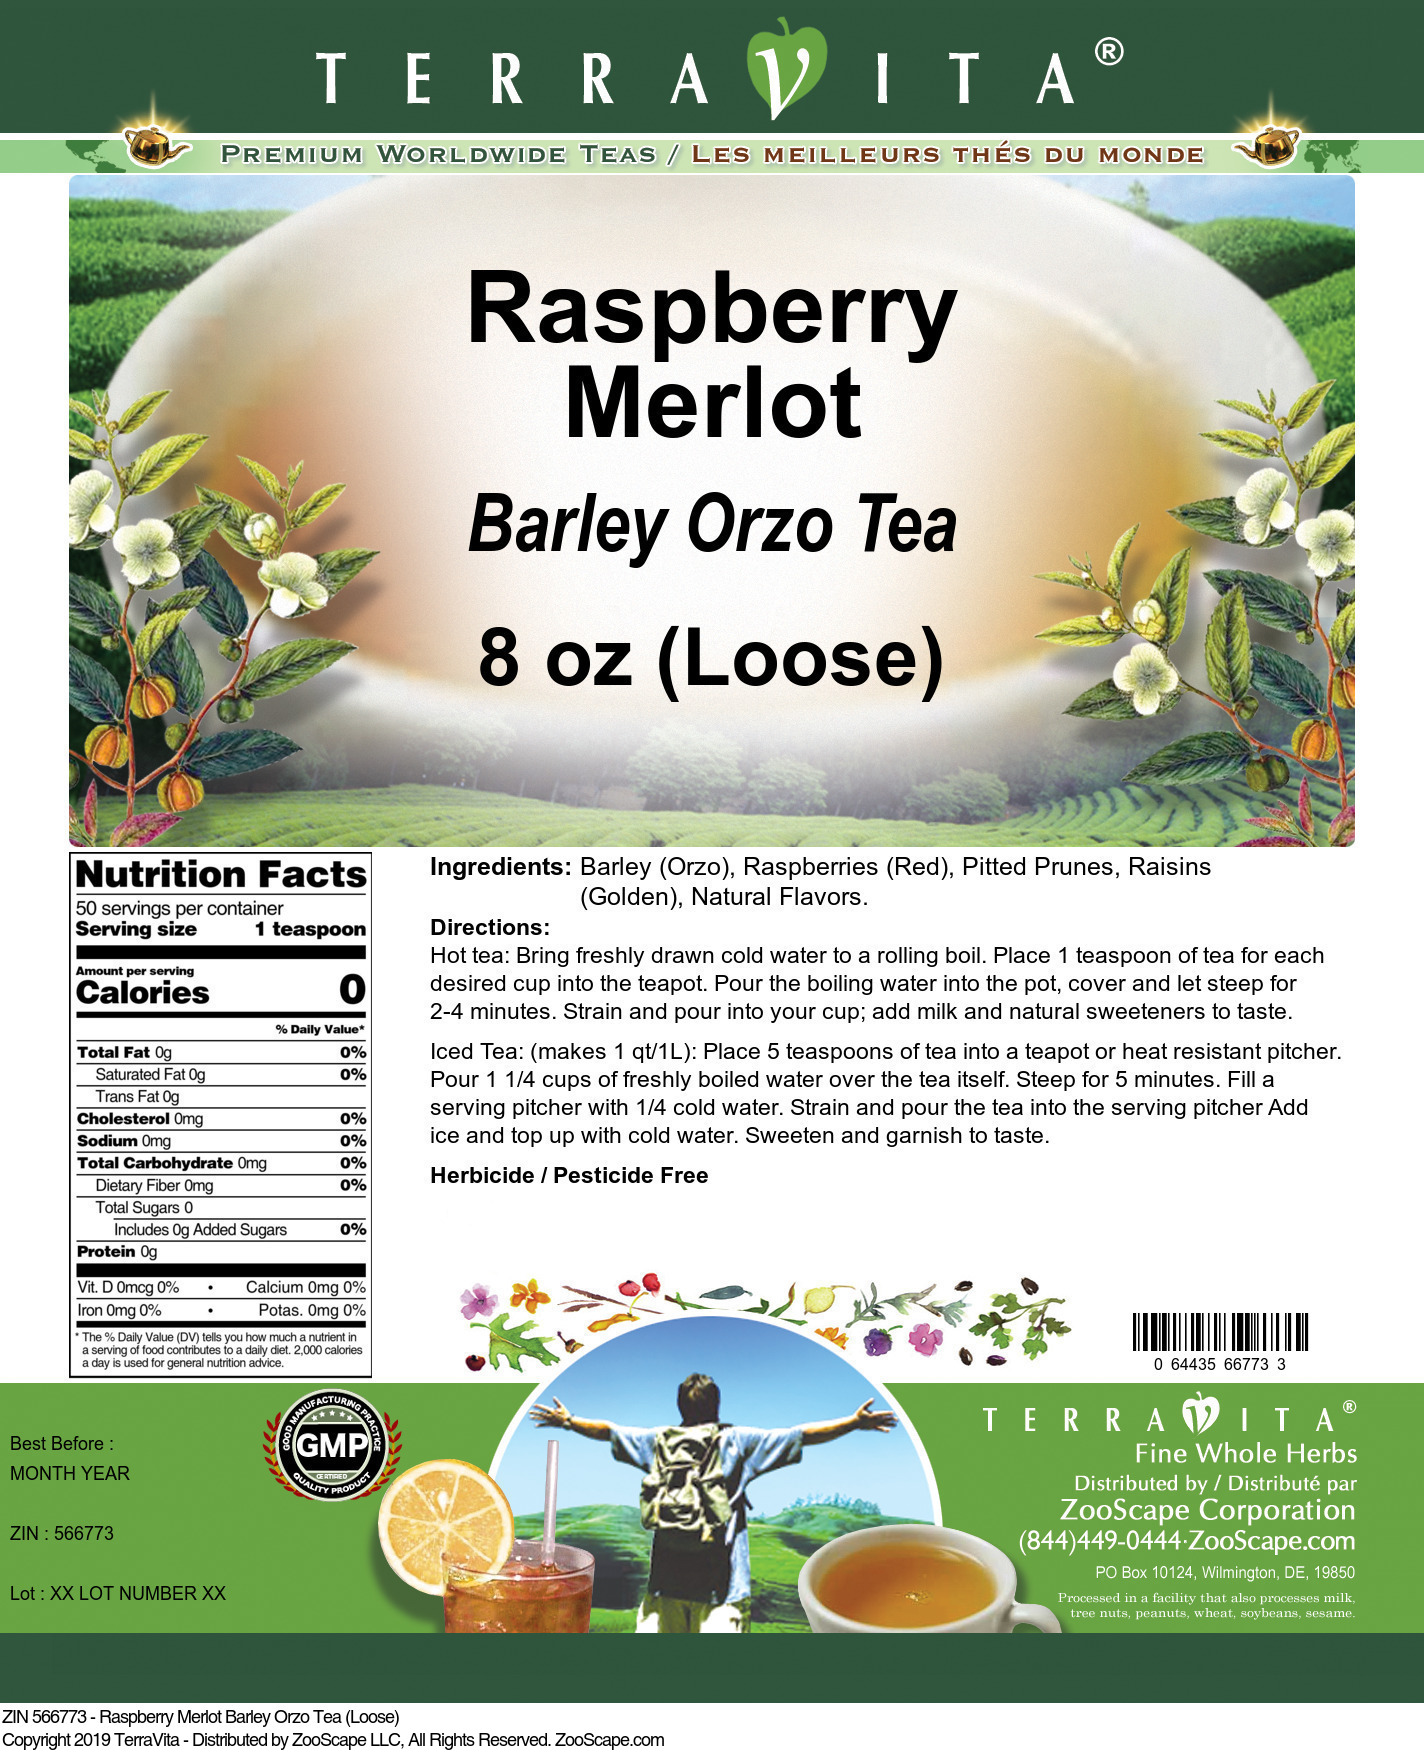 Raspberry Merlot Barley Orzo Tea (Loose)